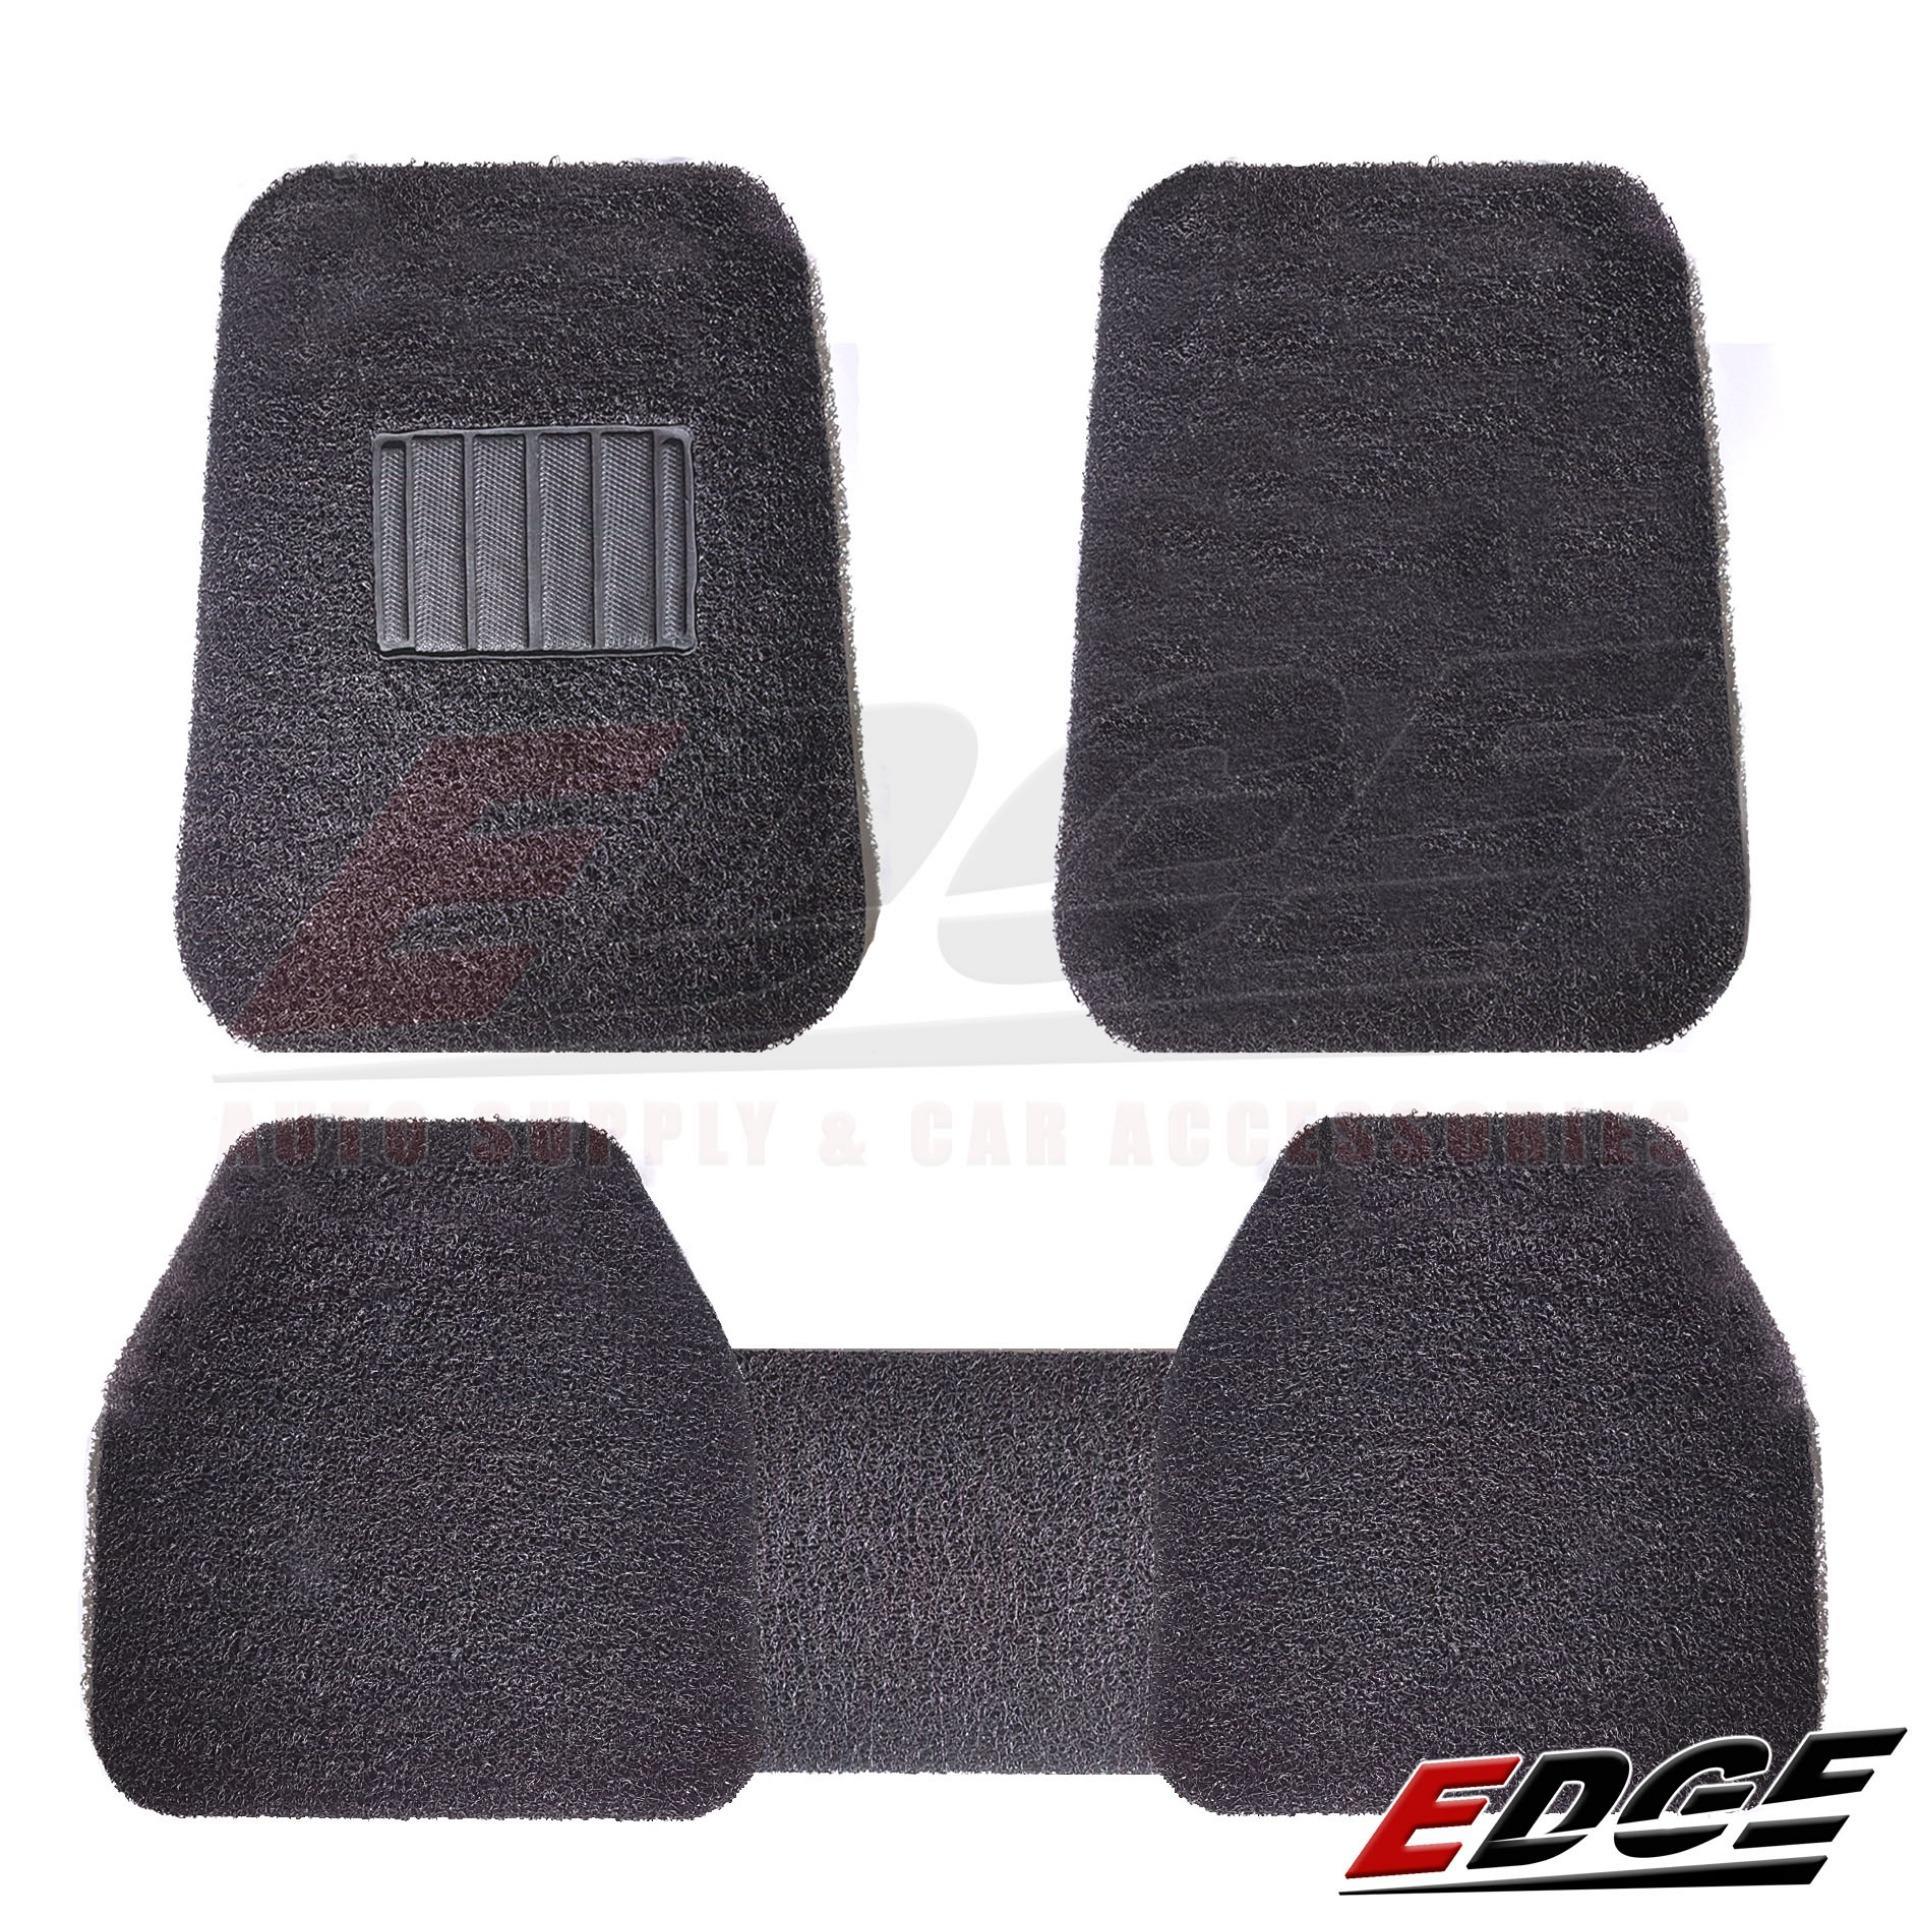 Universal SPAGHETTI / COIL Rubber Matting 5pcs/set // car mat floor guard protection